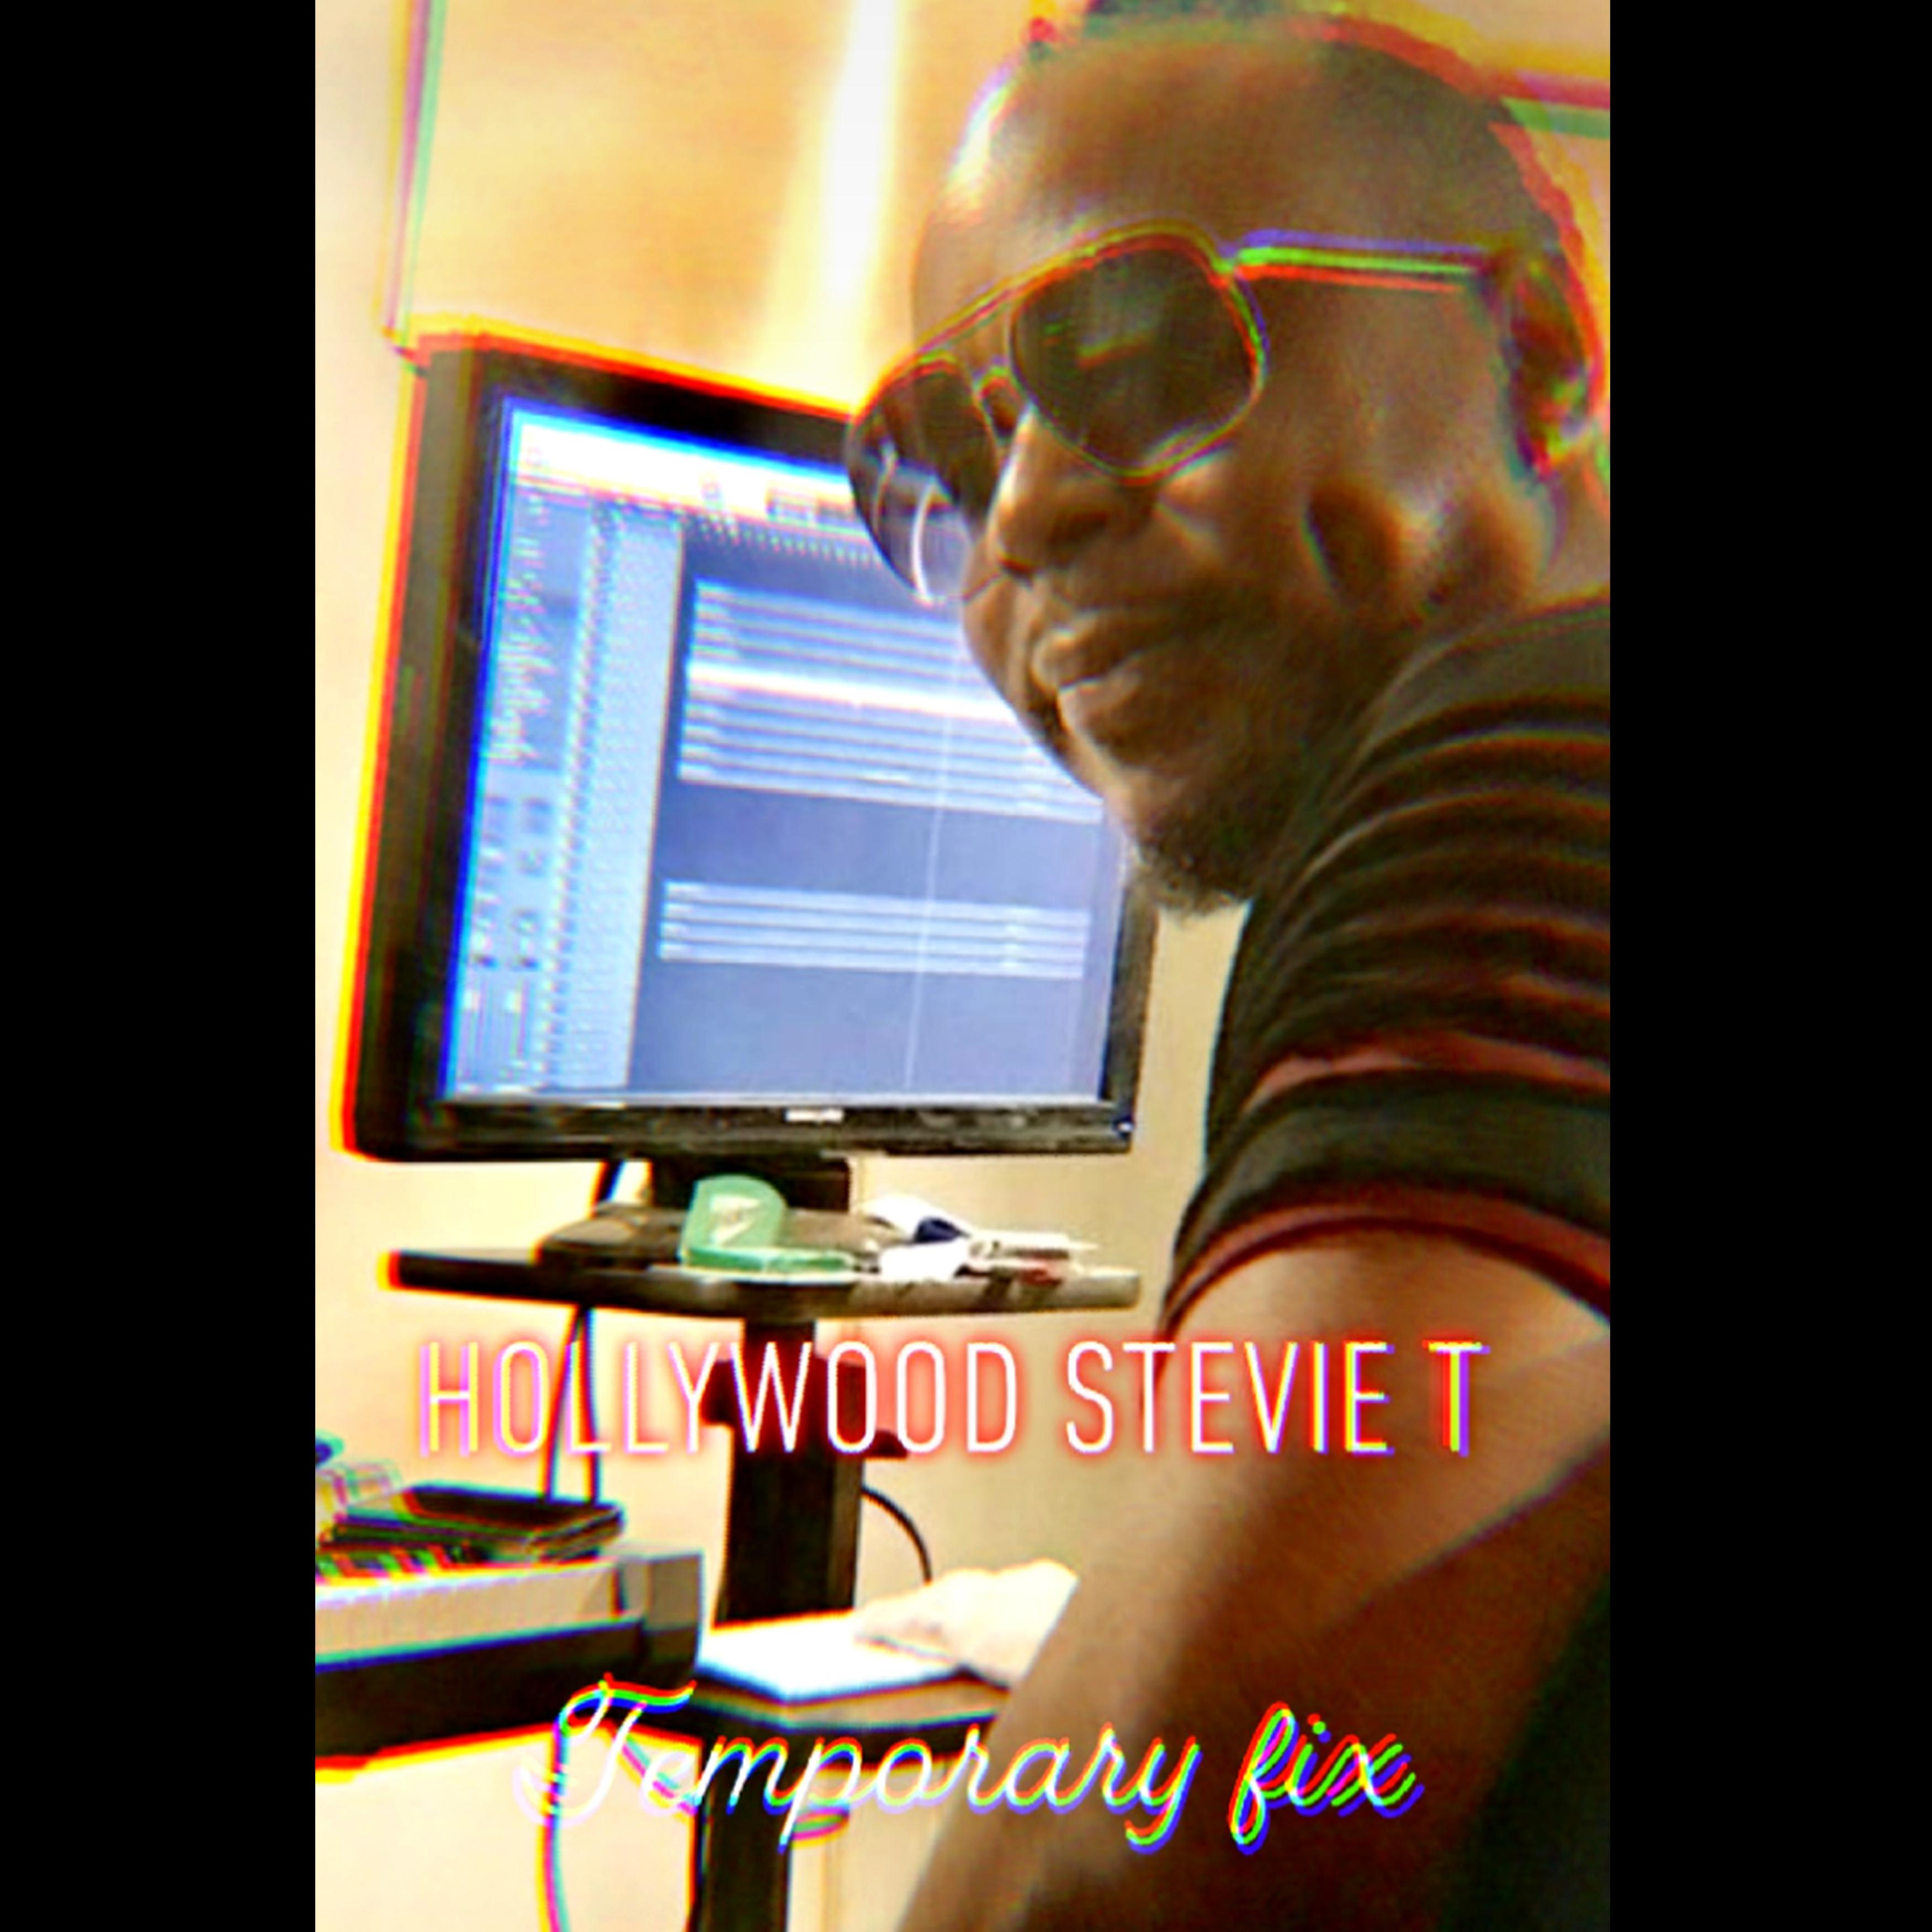 Hollywood Stevie T - Temporary Fix